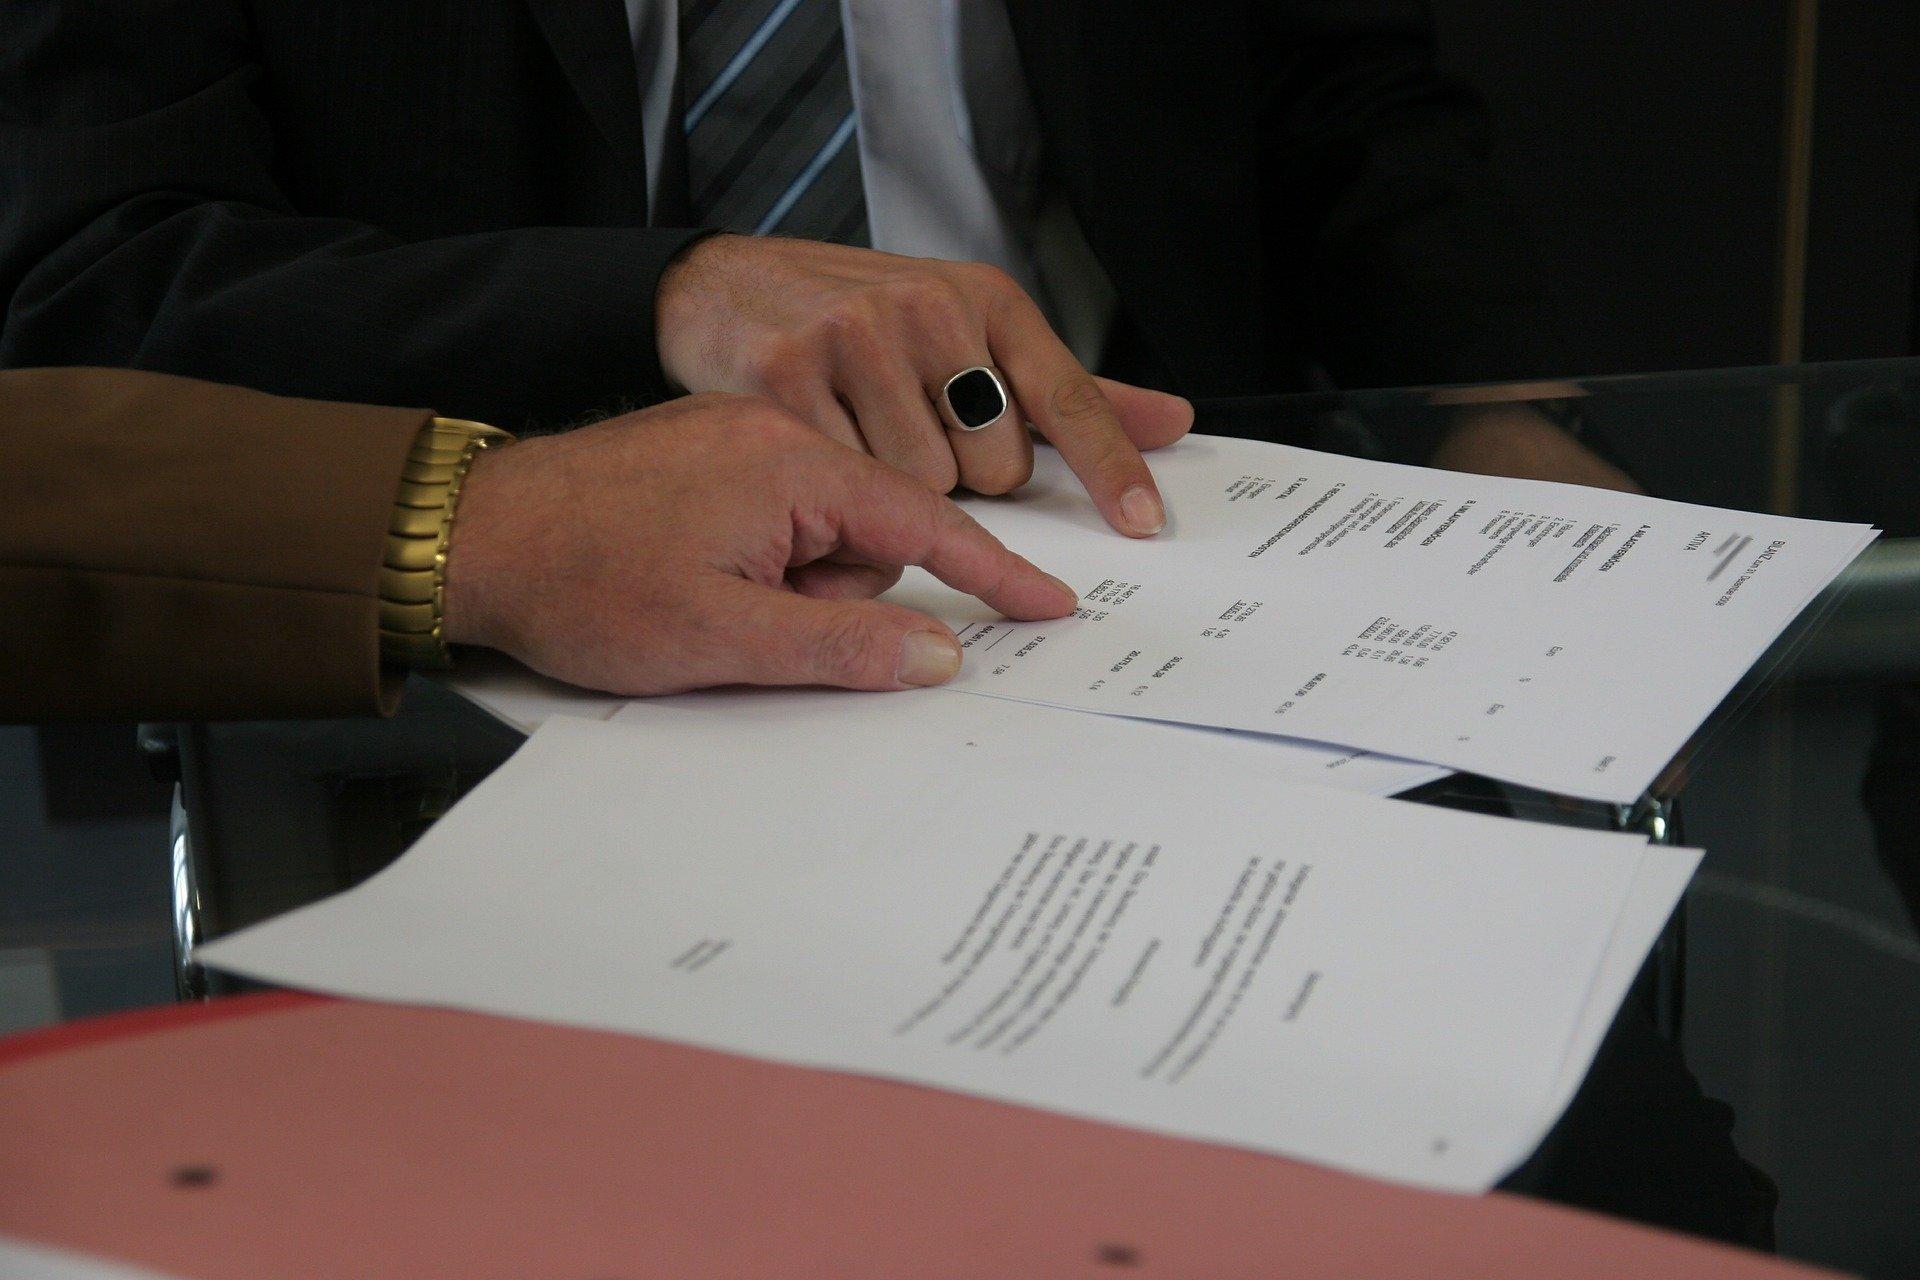 dohoda, smlouva, ruce